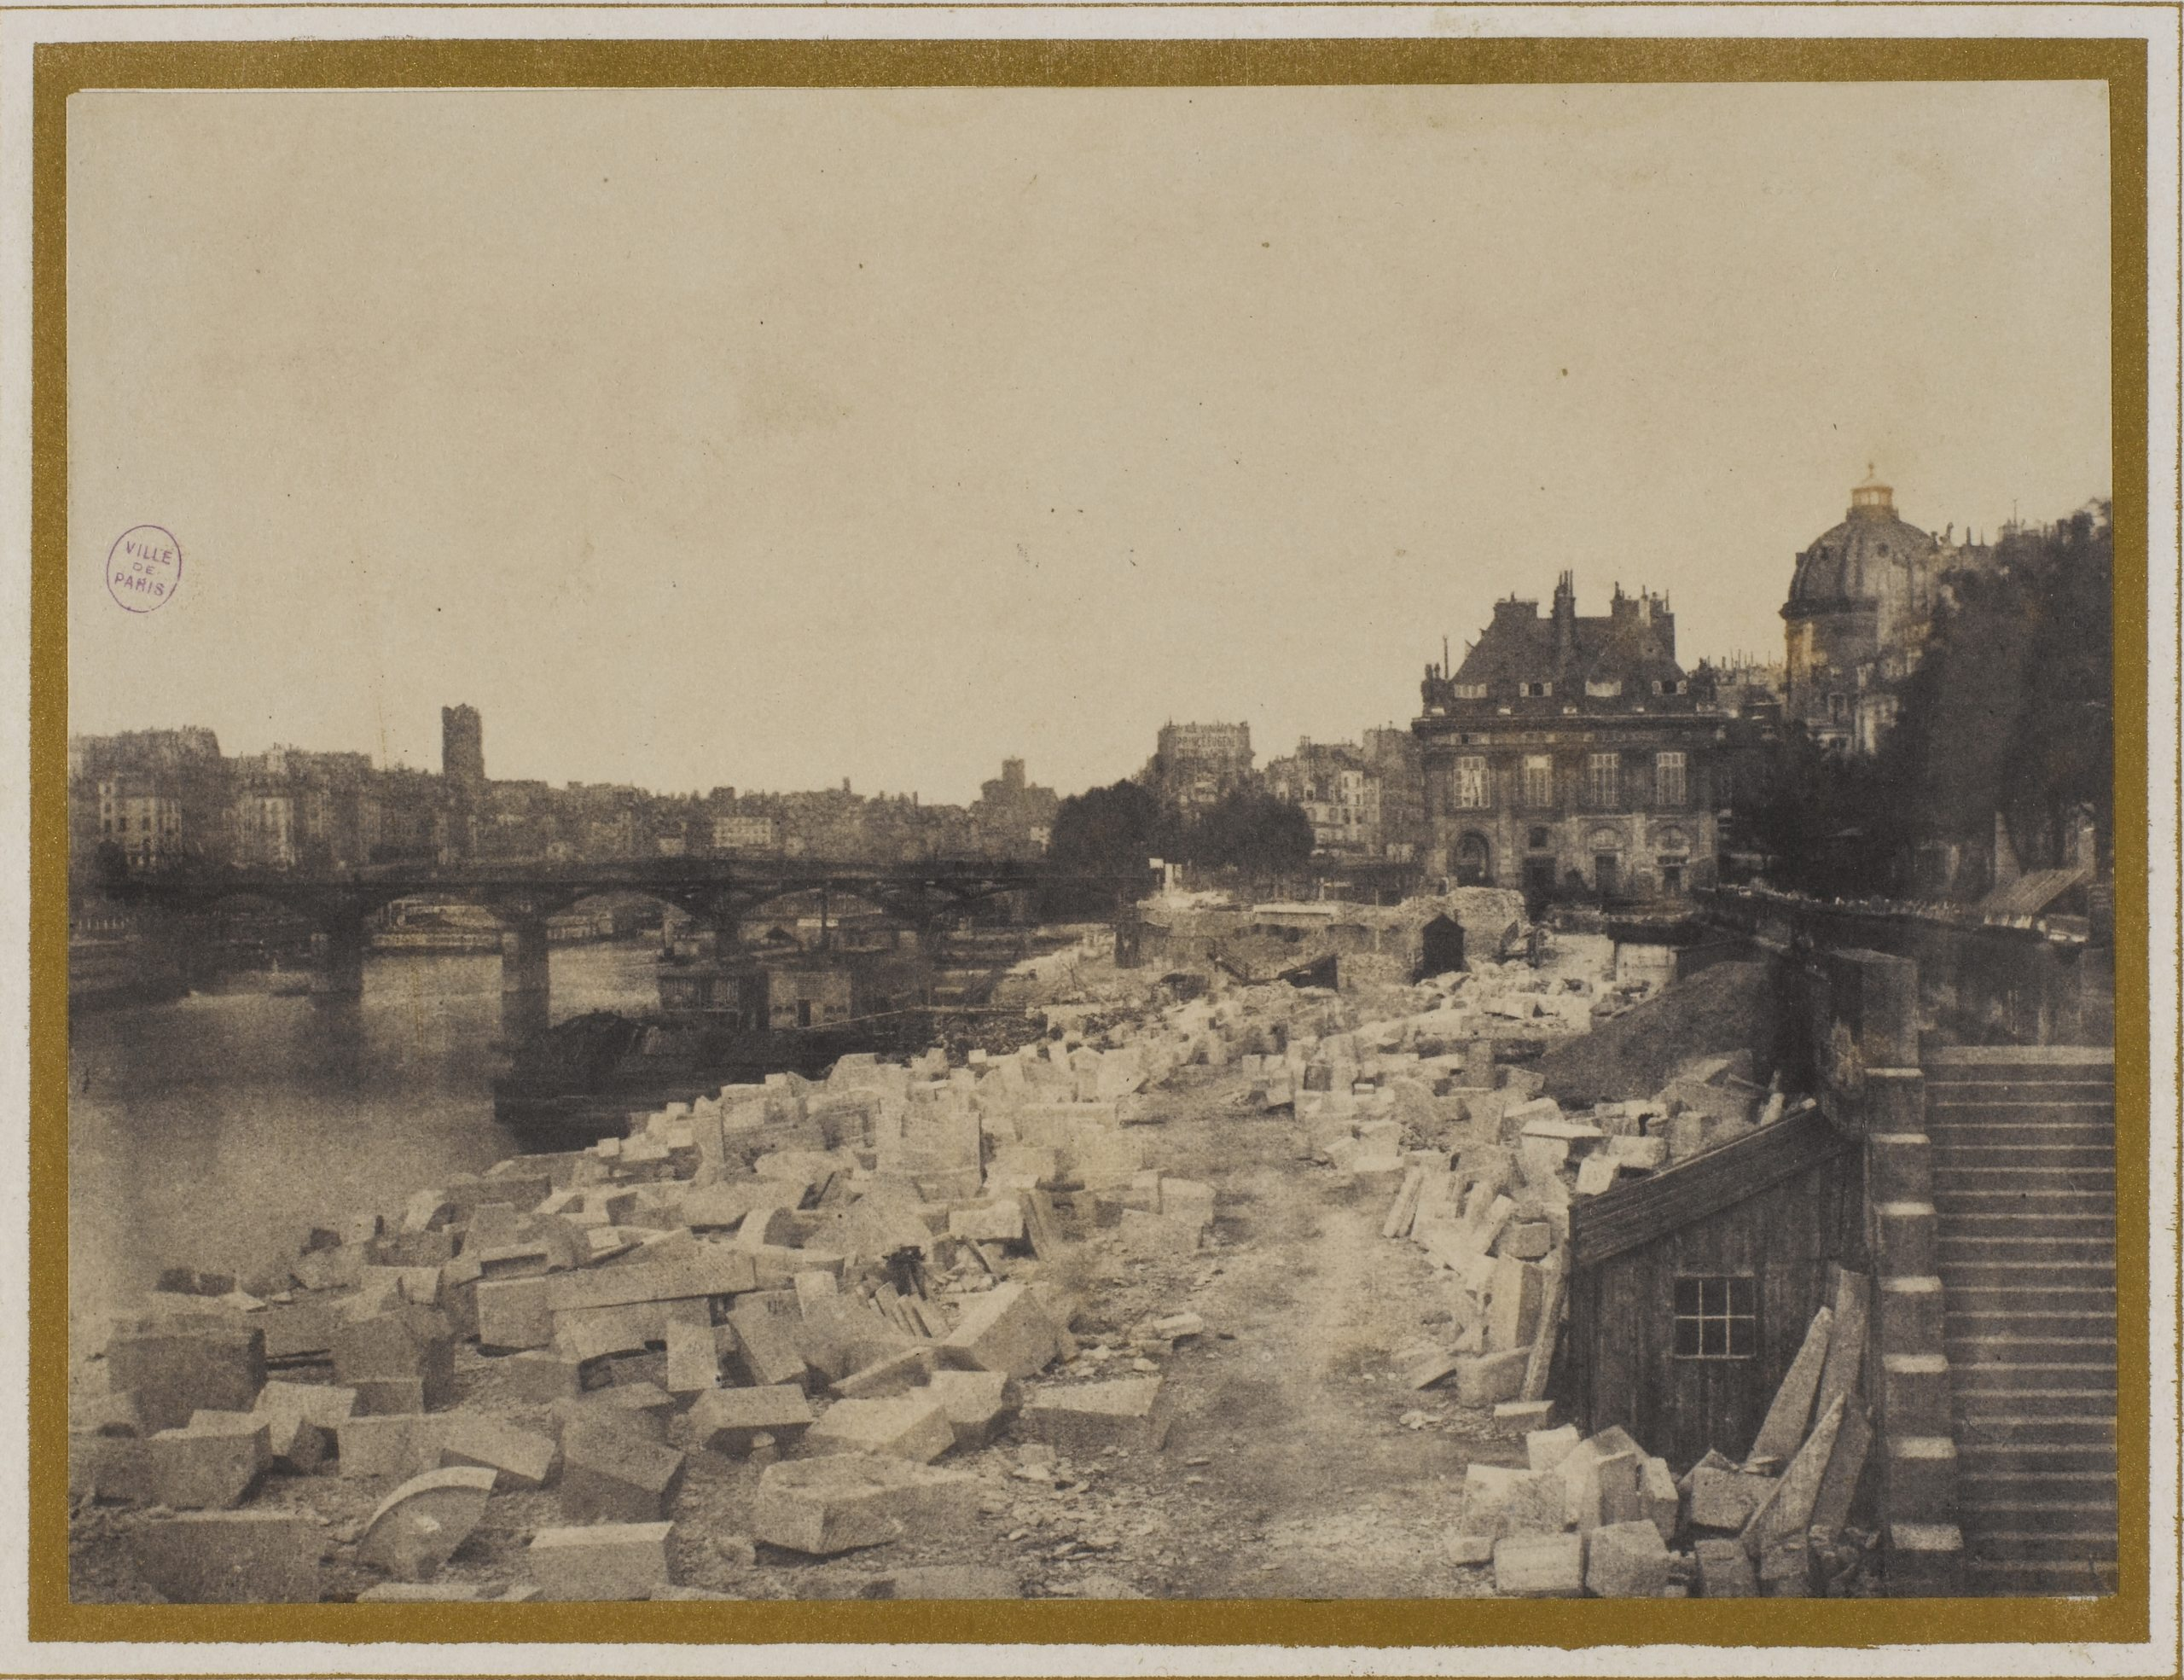 Paris au XVIIIe siècle - Page 6 Image_51